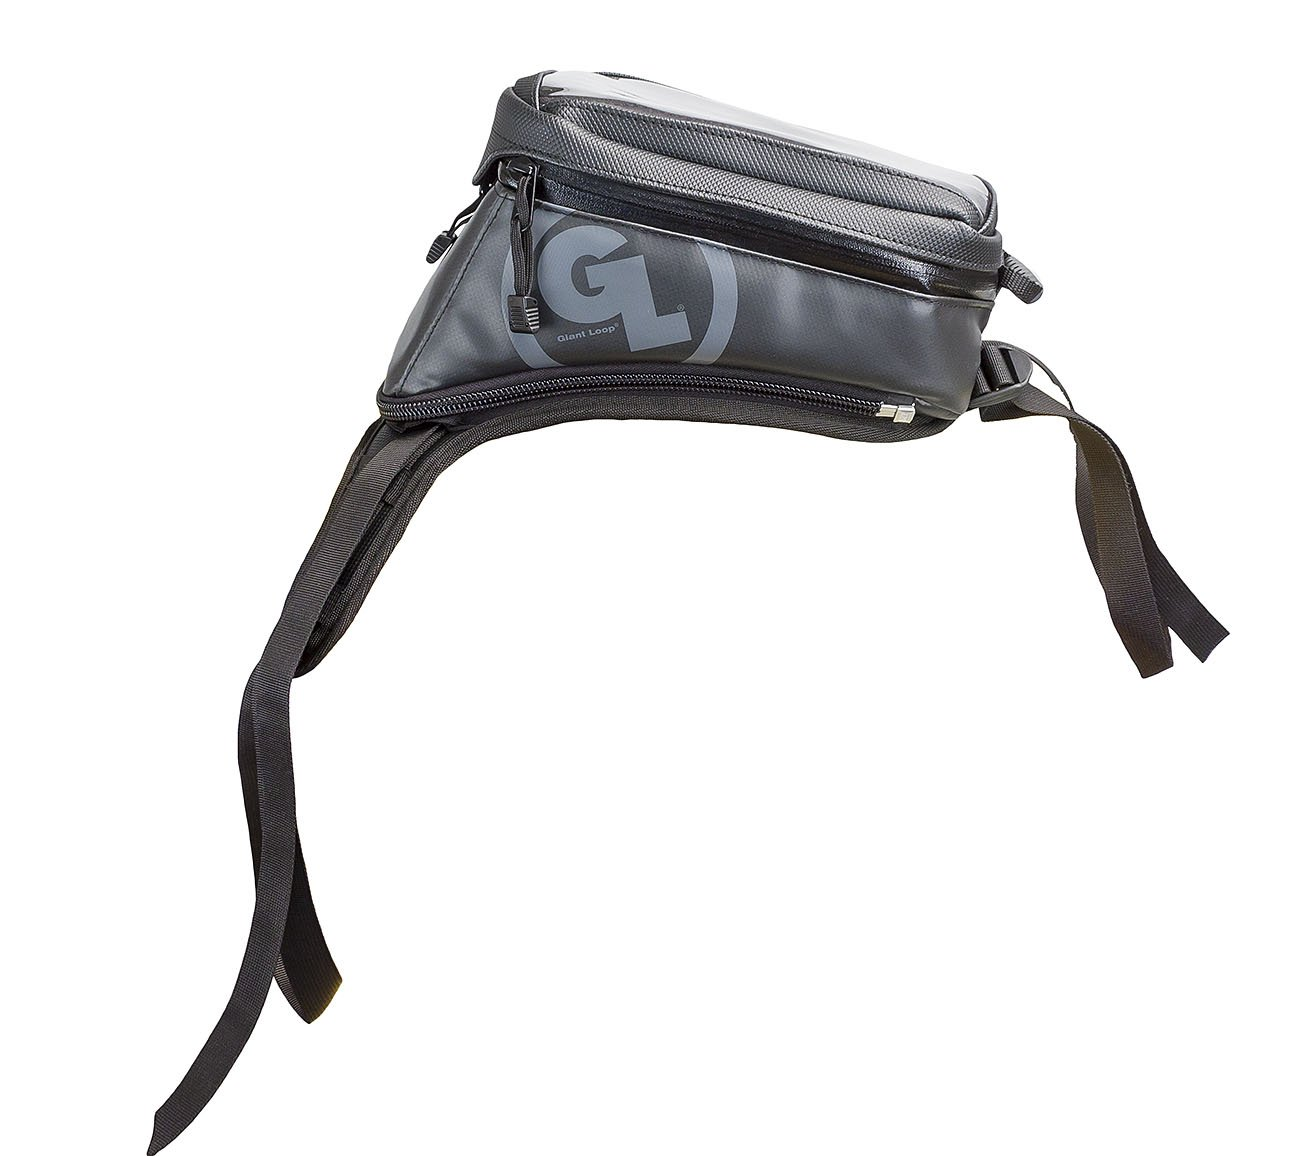 4 Liter Capacity Giant Loop DTB-GRAY Diablo Tank Bag